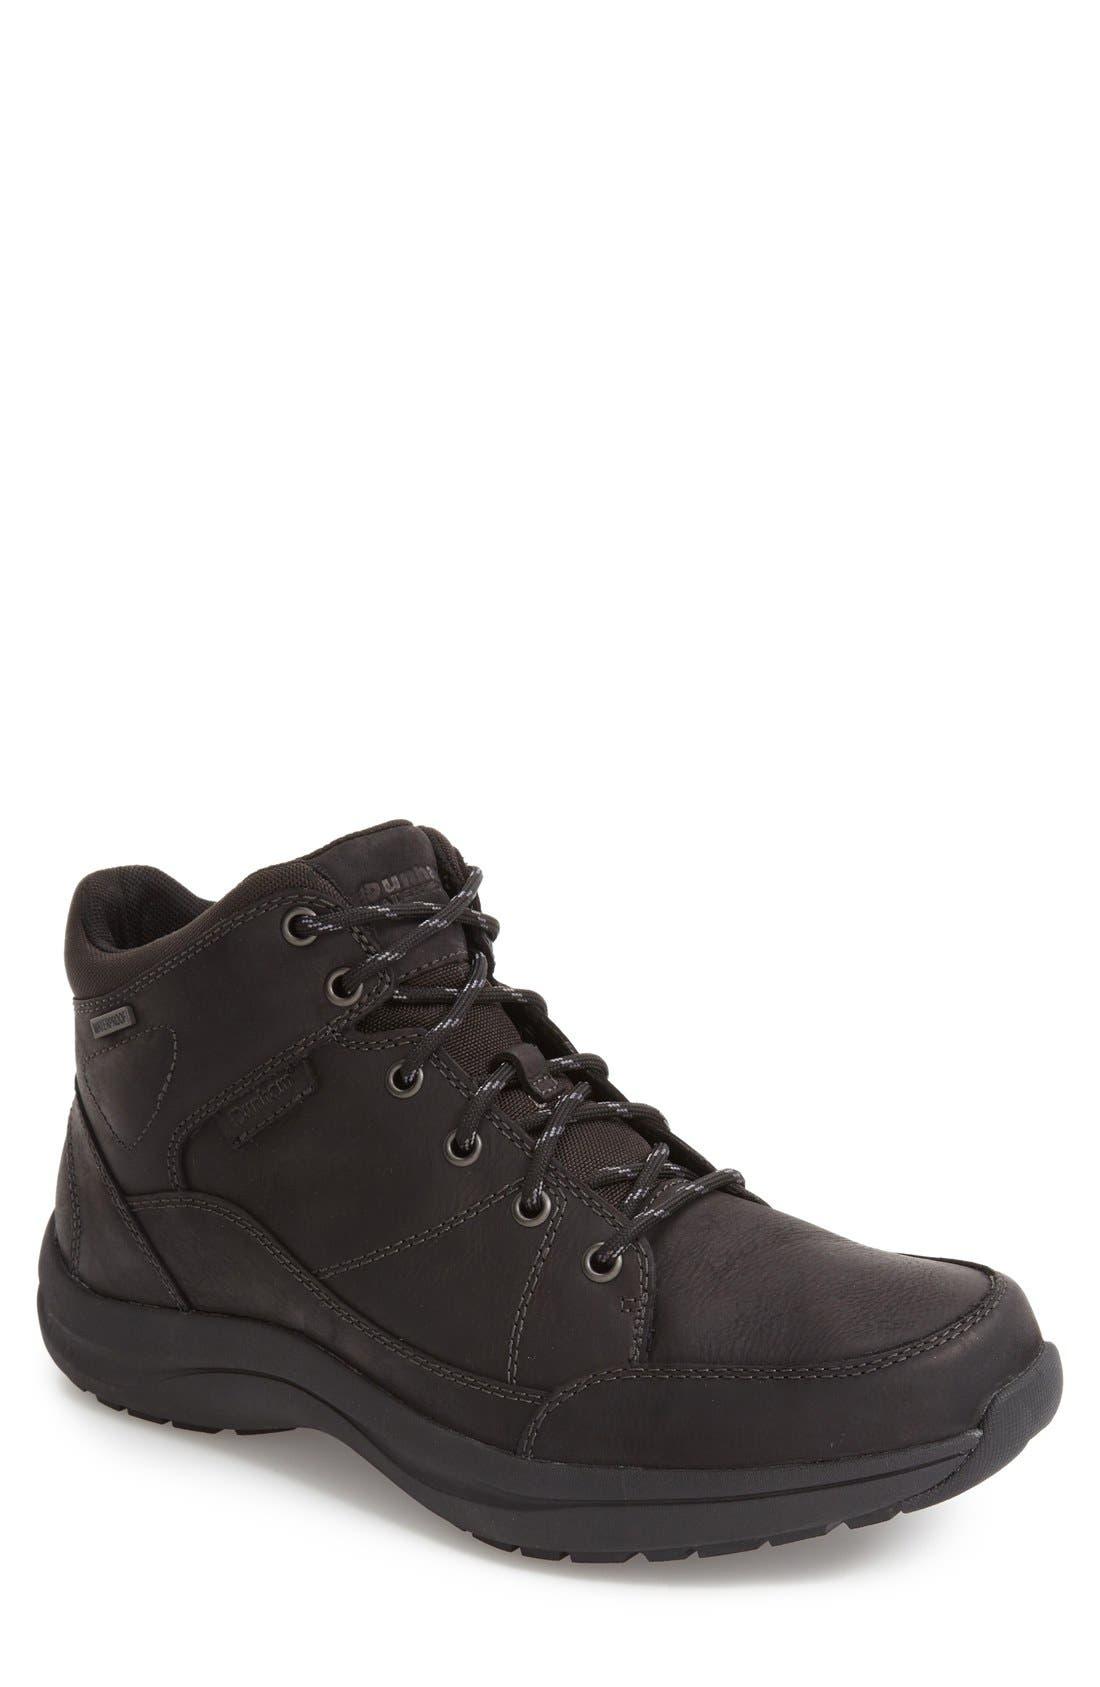 Simon-Dun Waterproof Boot,                             Main thumbnail 1, color,                             Black Leather